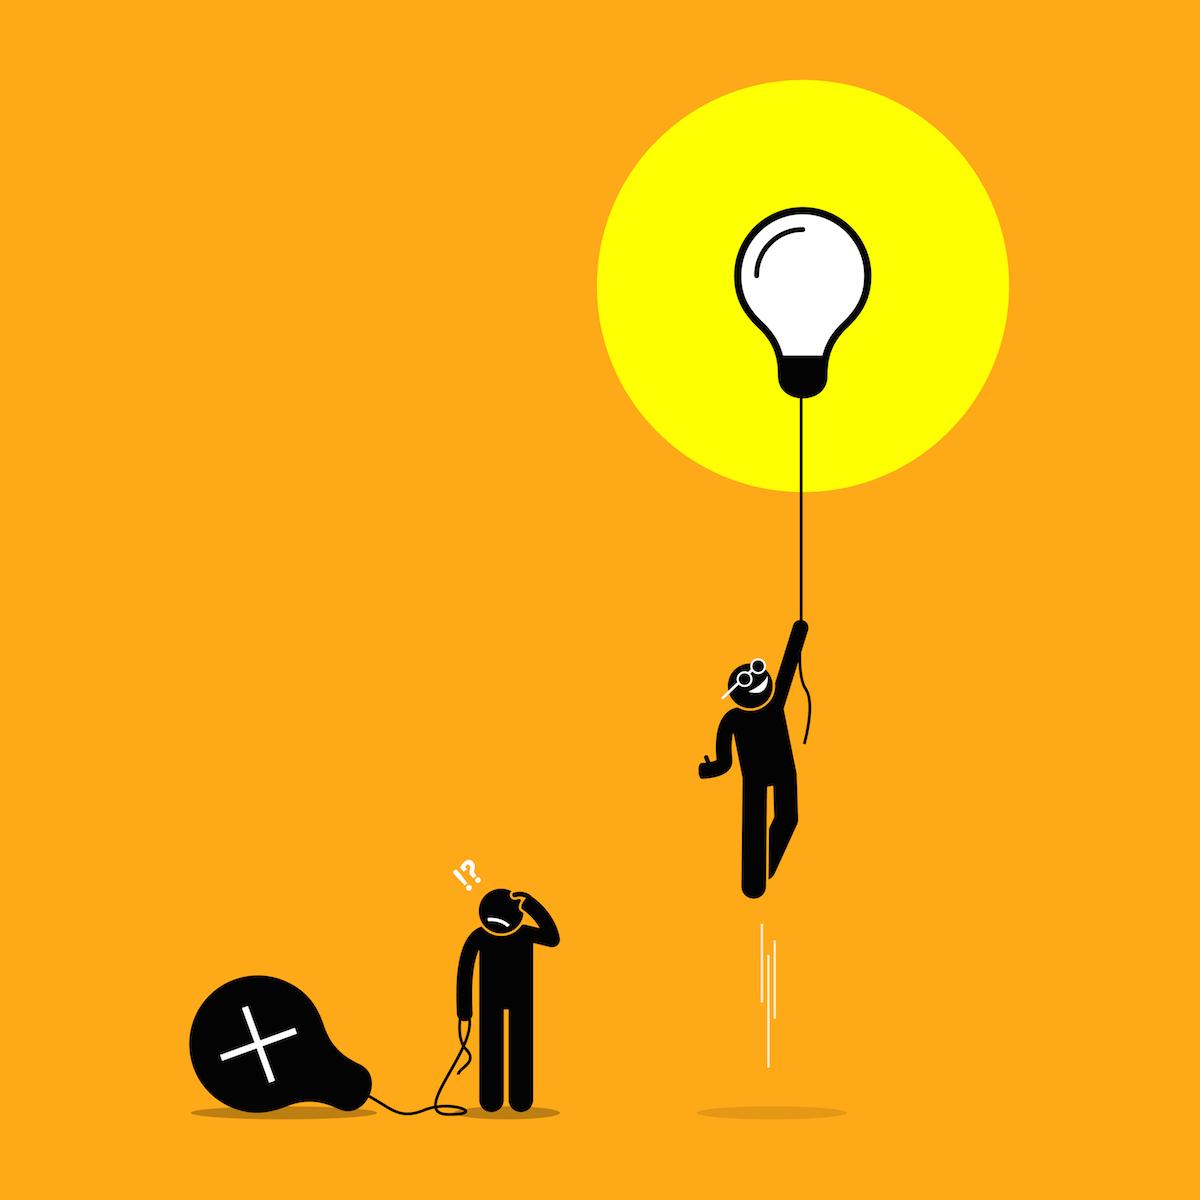 Business idea failure vs. success